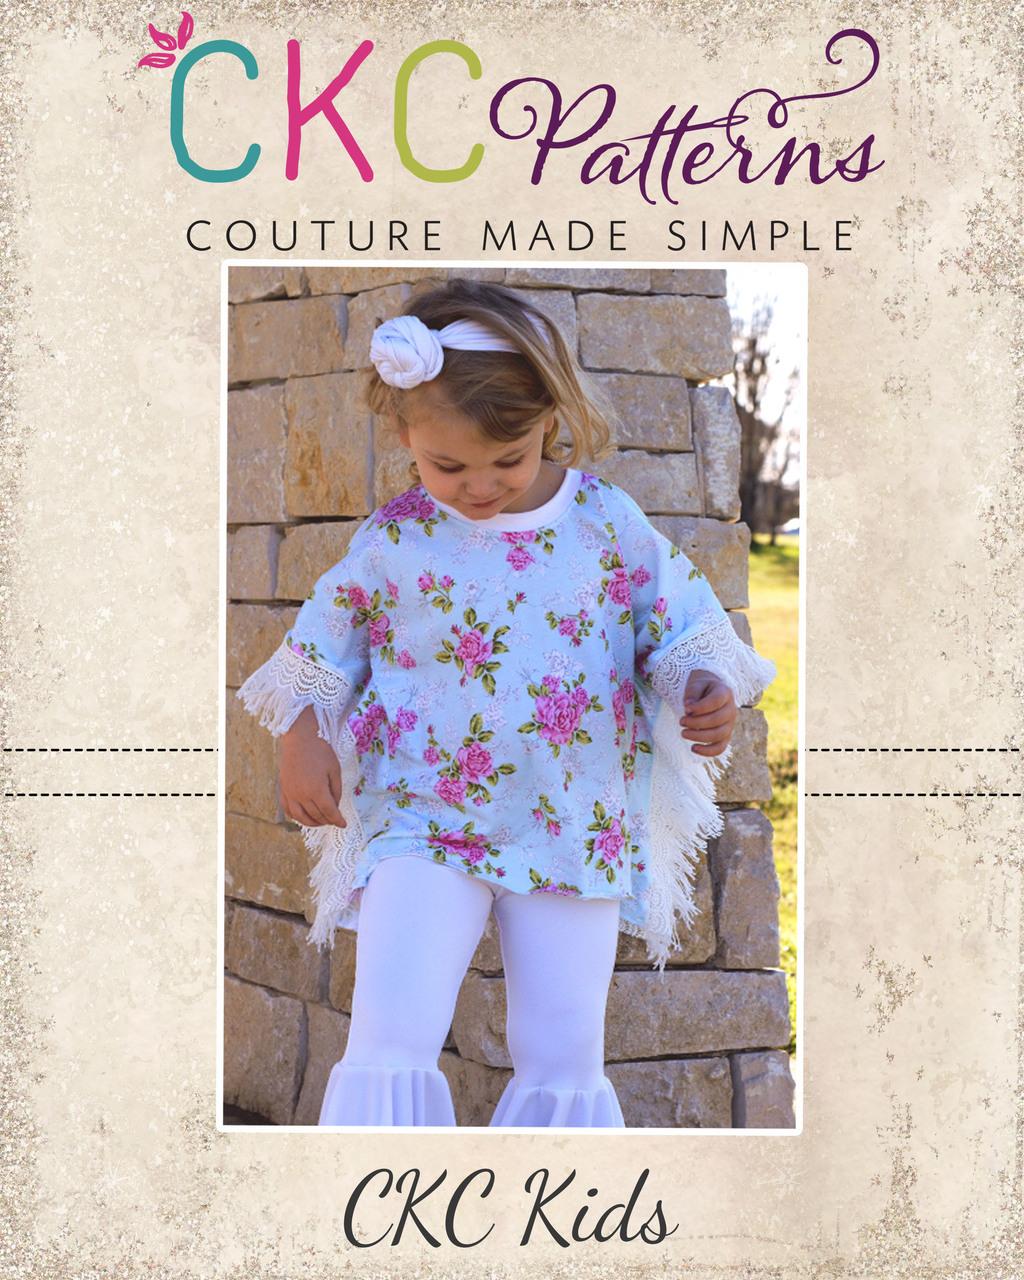 Serendipity's Boho Knit Top and Dress Sizes 2T to 14 Kids PDF Pattern